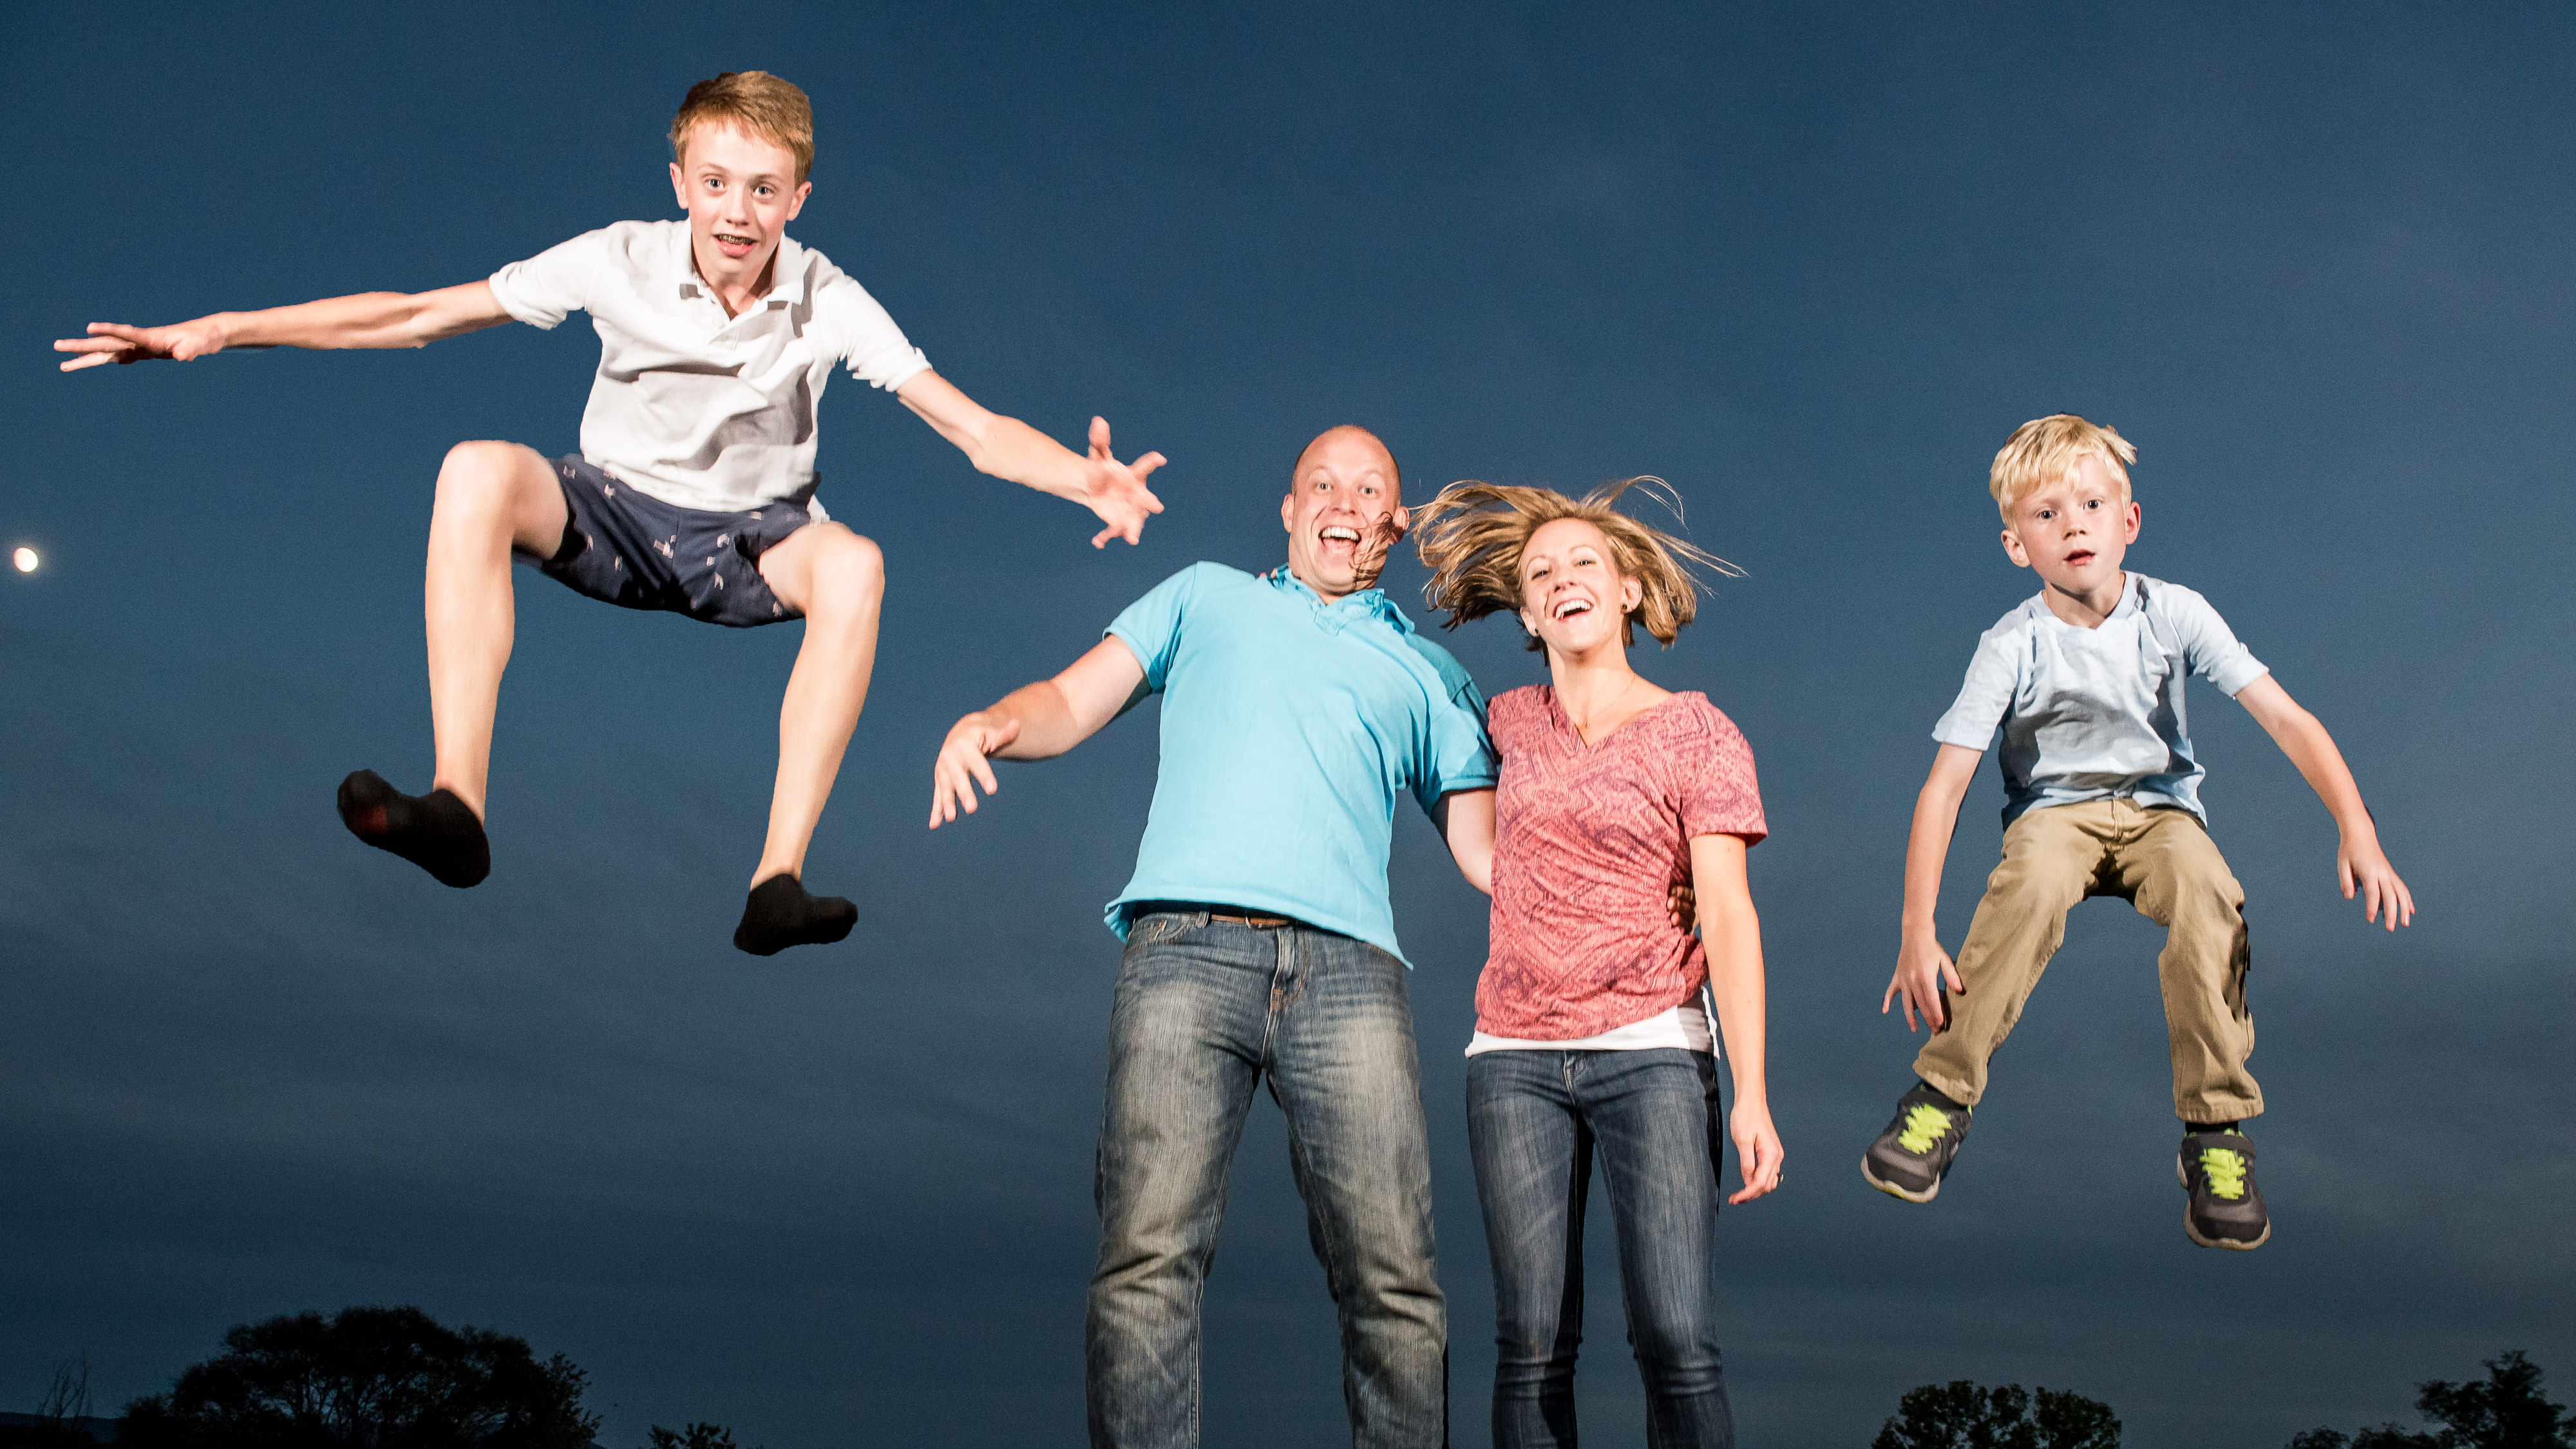 Fun family photos on trampoline